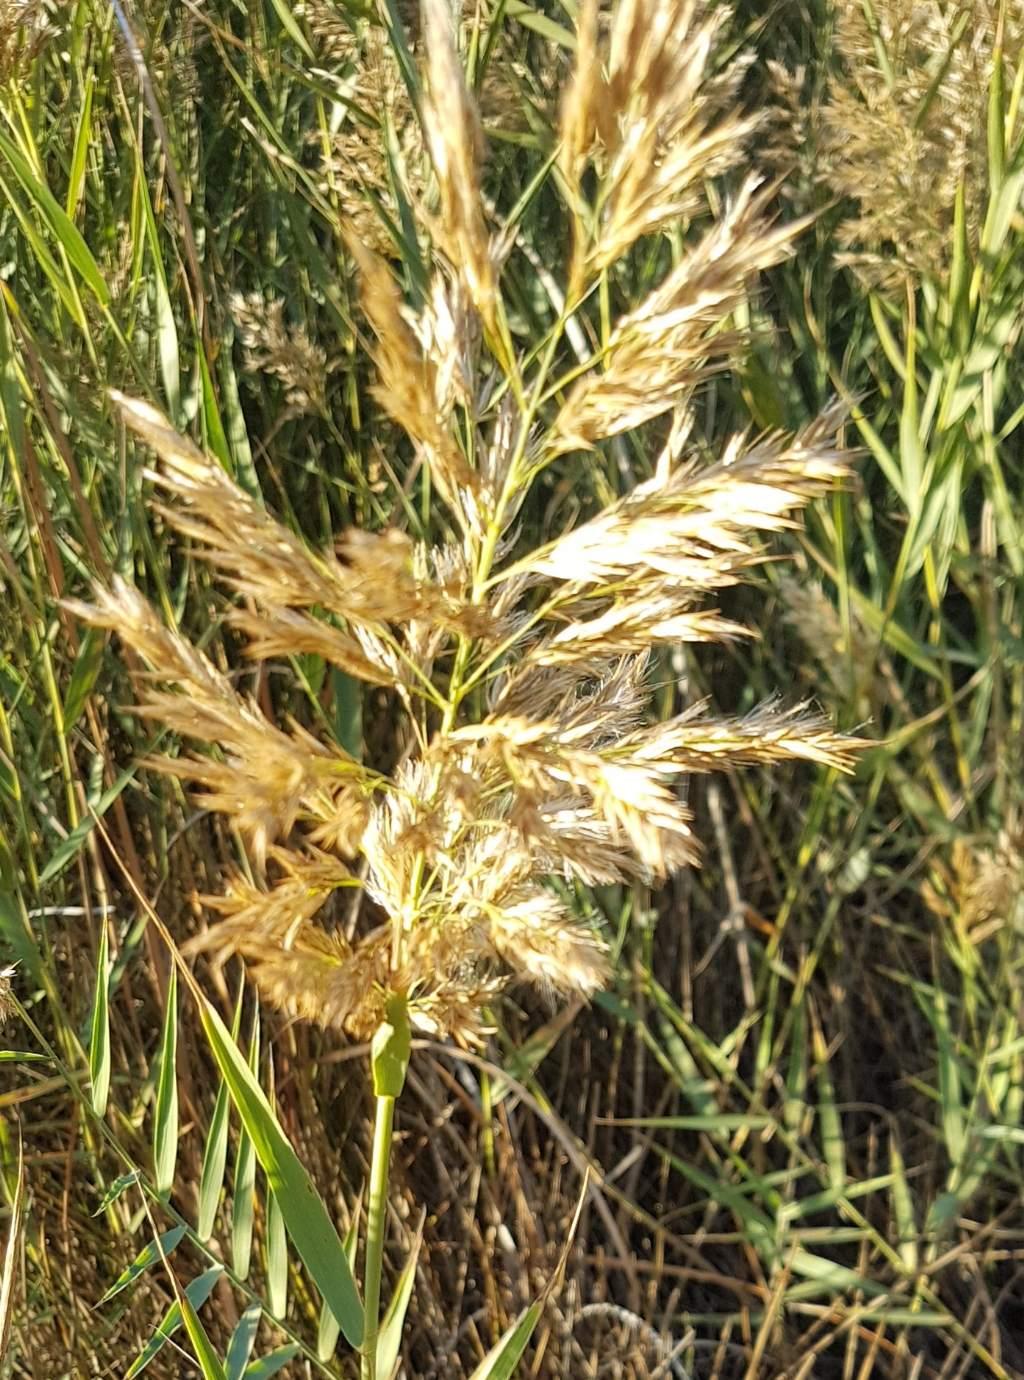 Typha angustifolia?   No, Phragmites australis